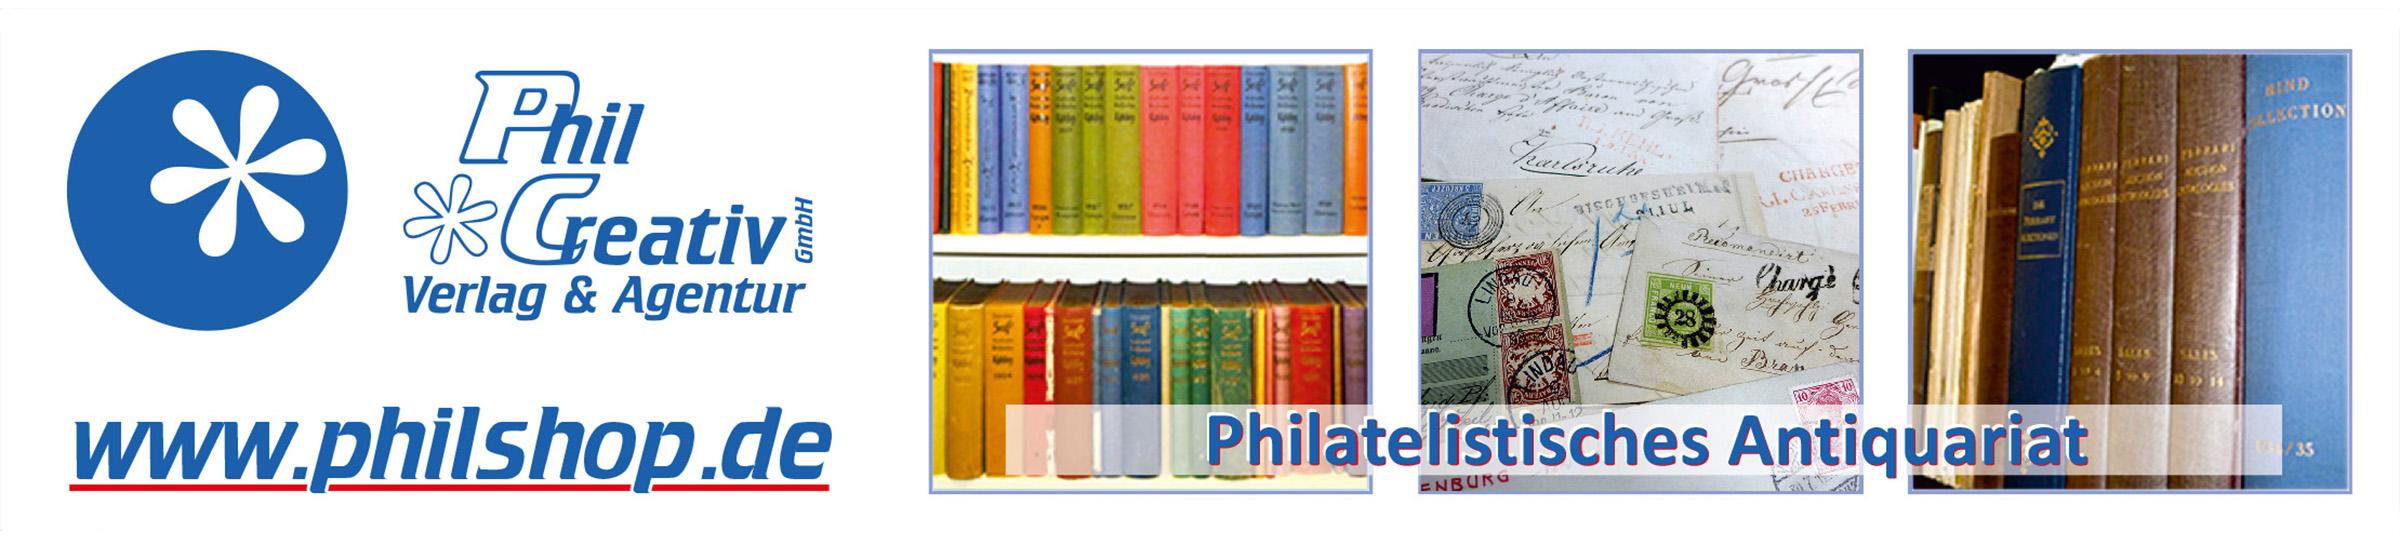 Phil*Creativ GmbH Verlag und Agentur